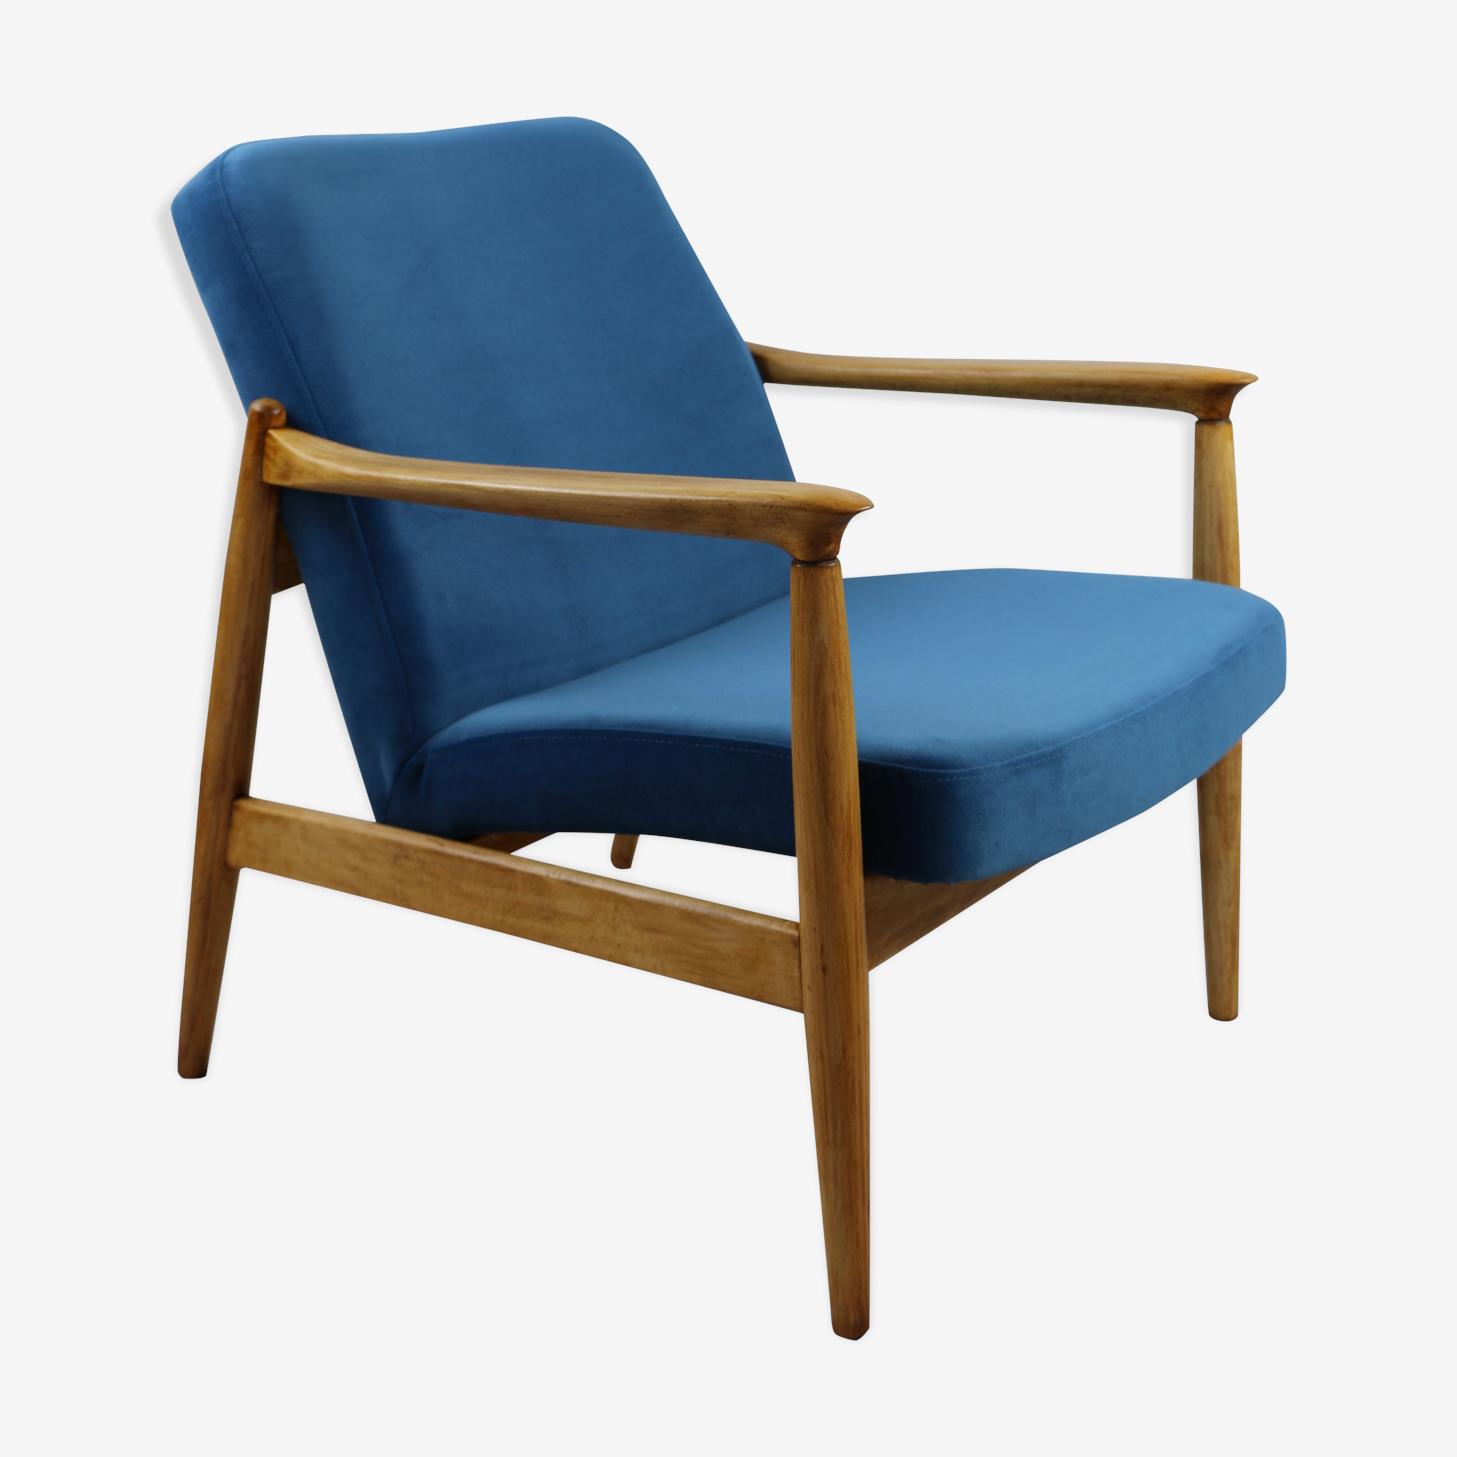 Blue armchair by Edmund Homa, 1970